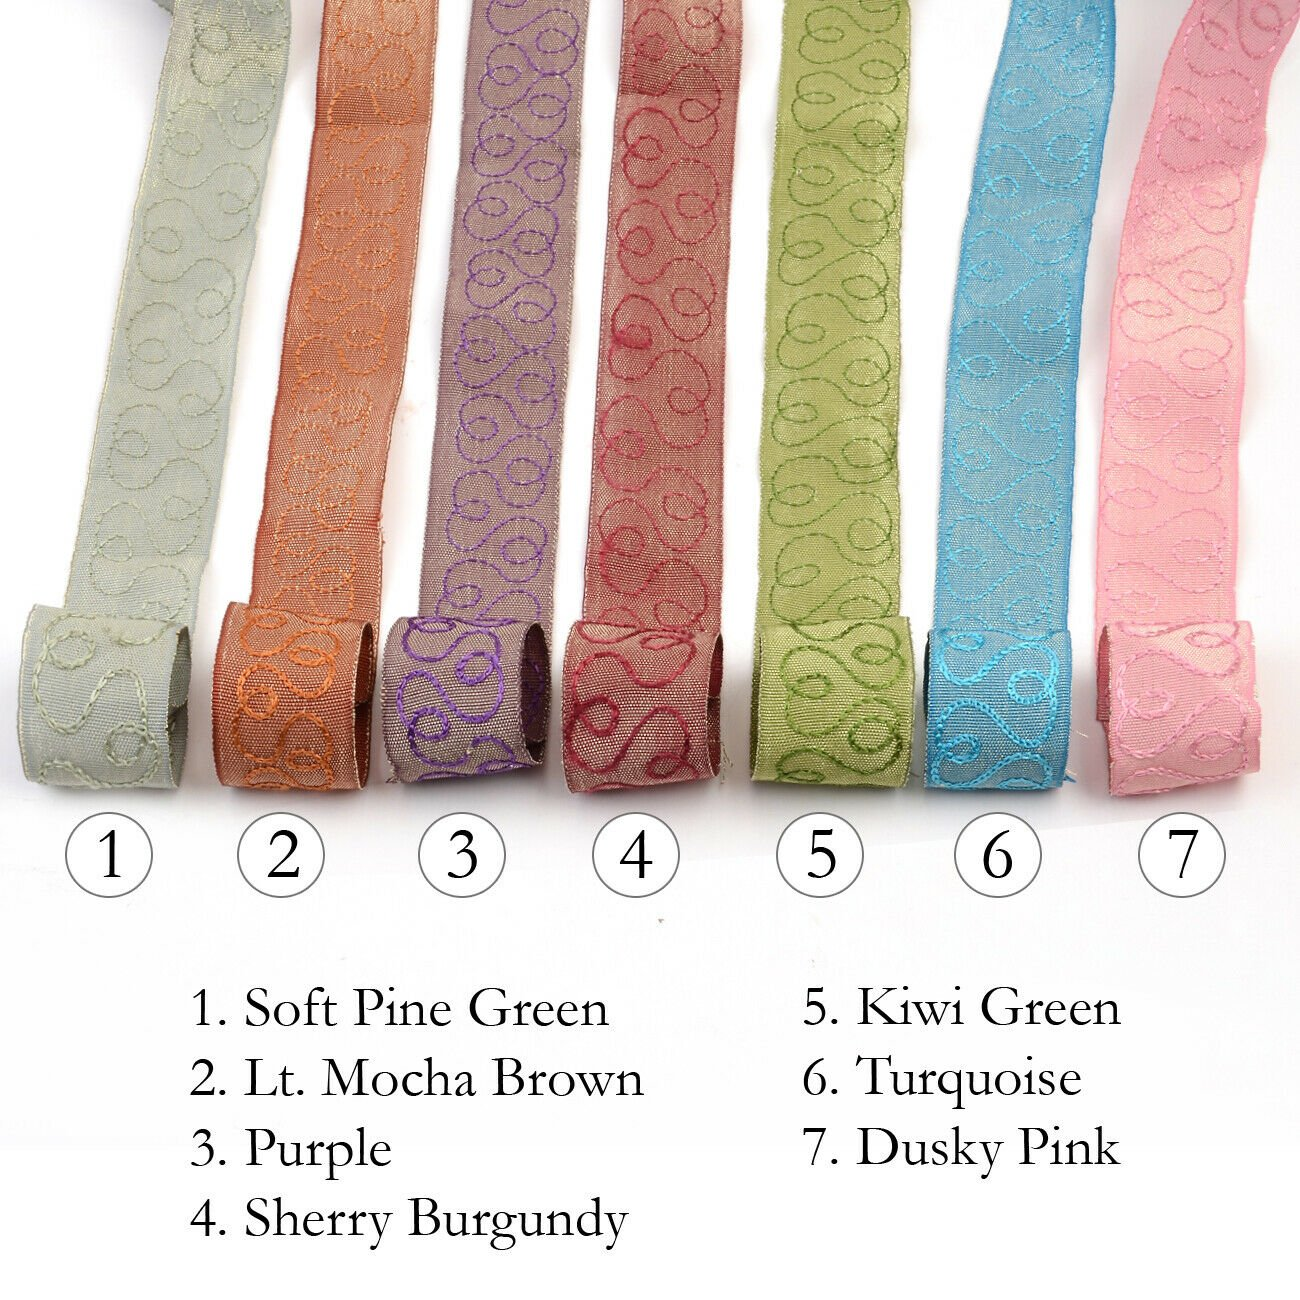 Cornelli Style Ribbon Trim Embroidery Embellished Braid 3cm, Pastel Sari Border